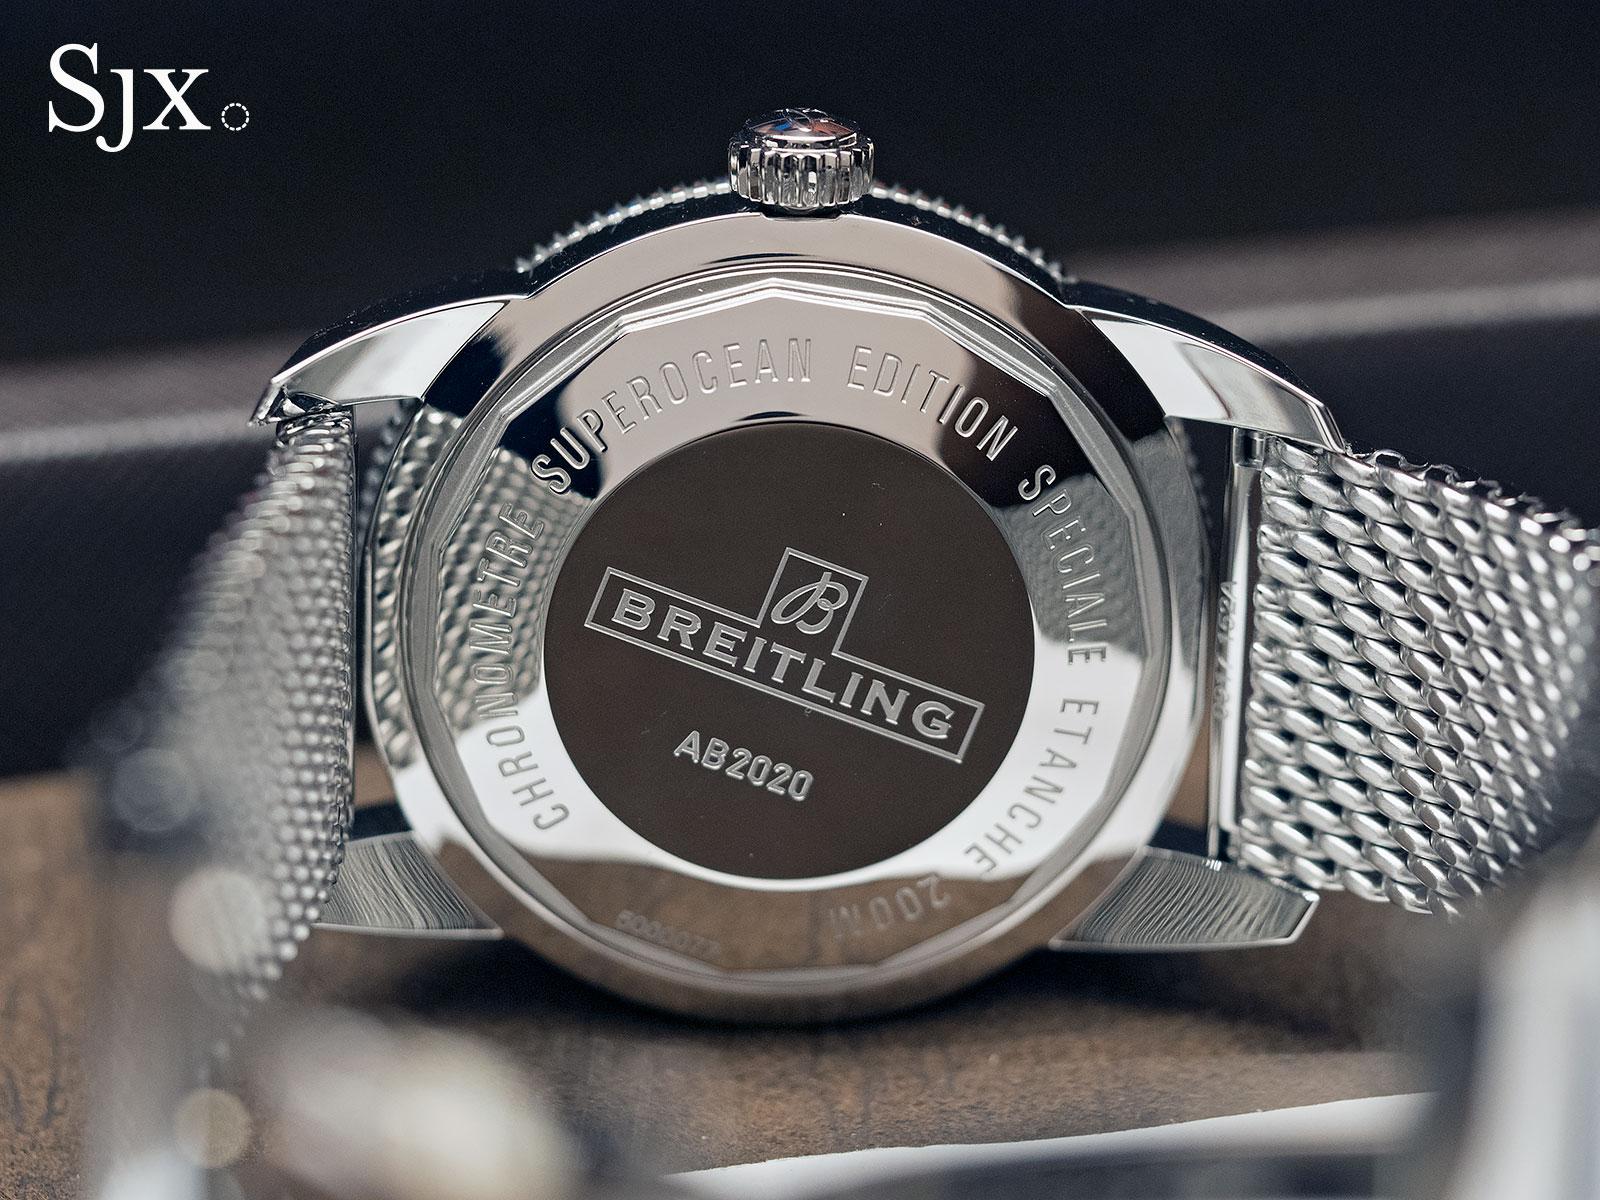 Breitling Superocean Heritage II 46-11